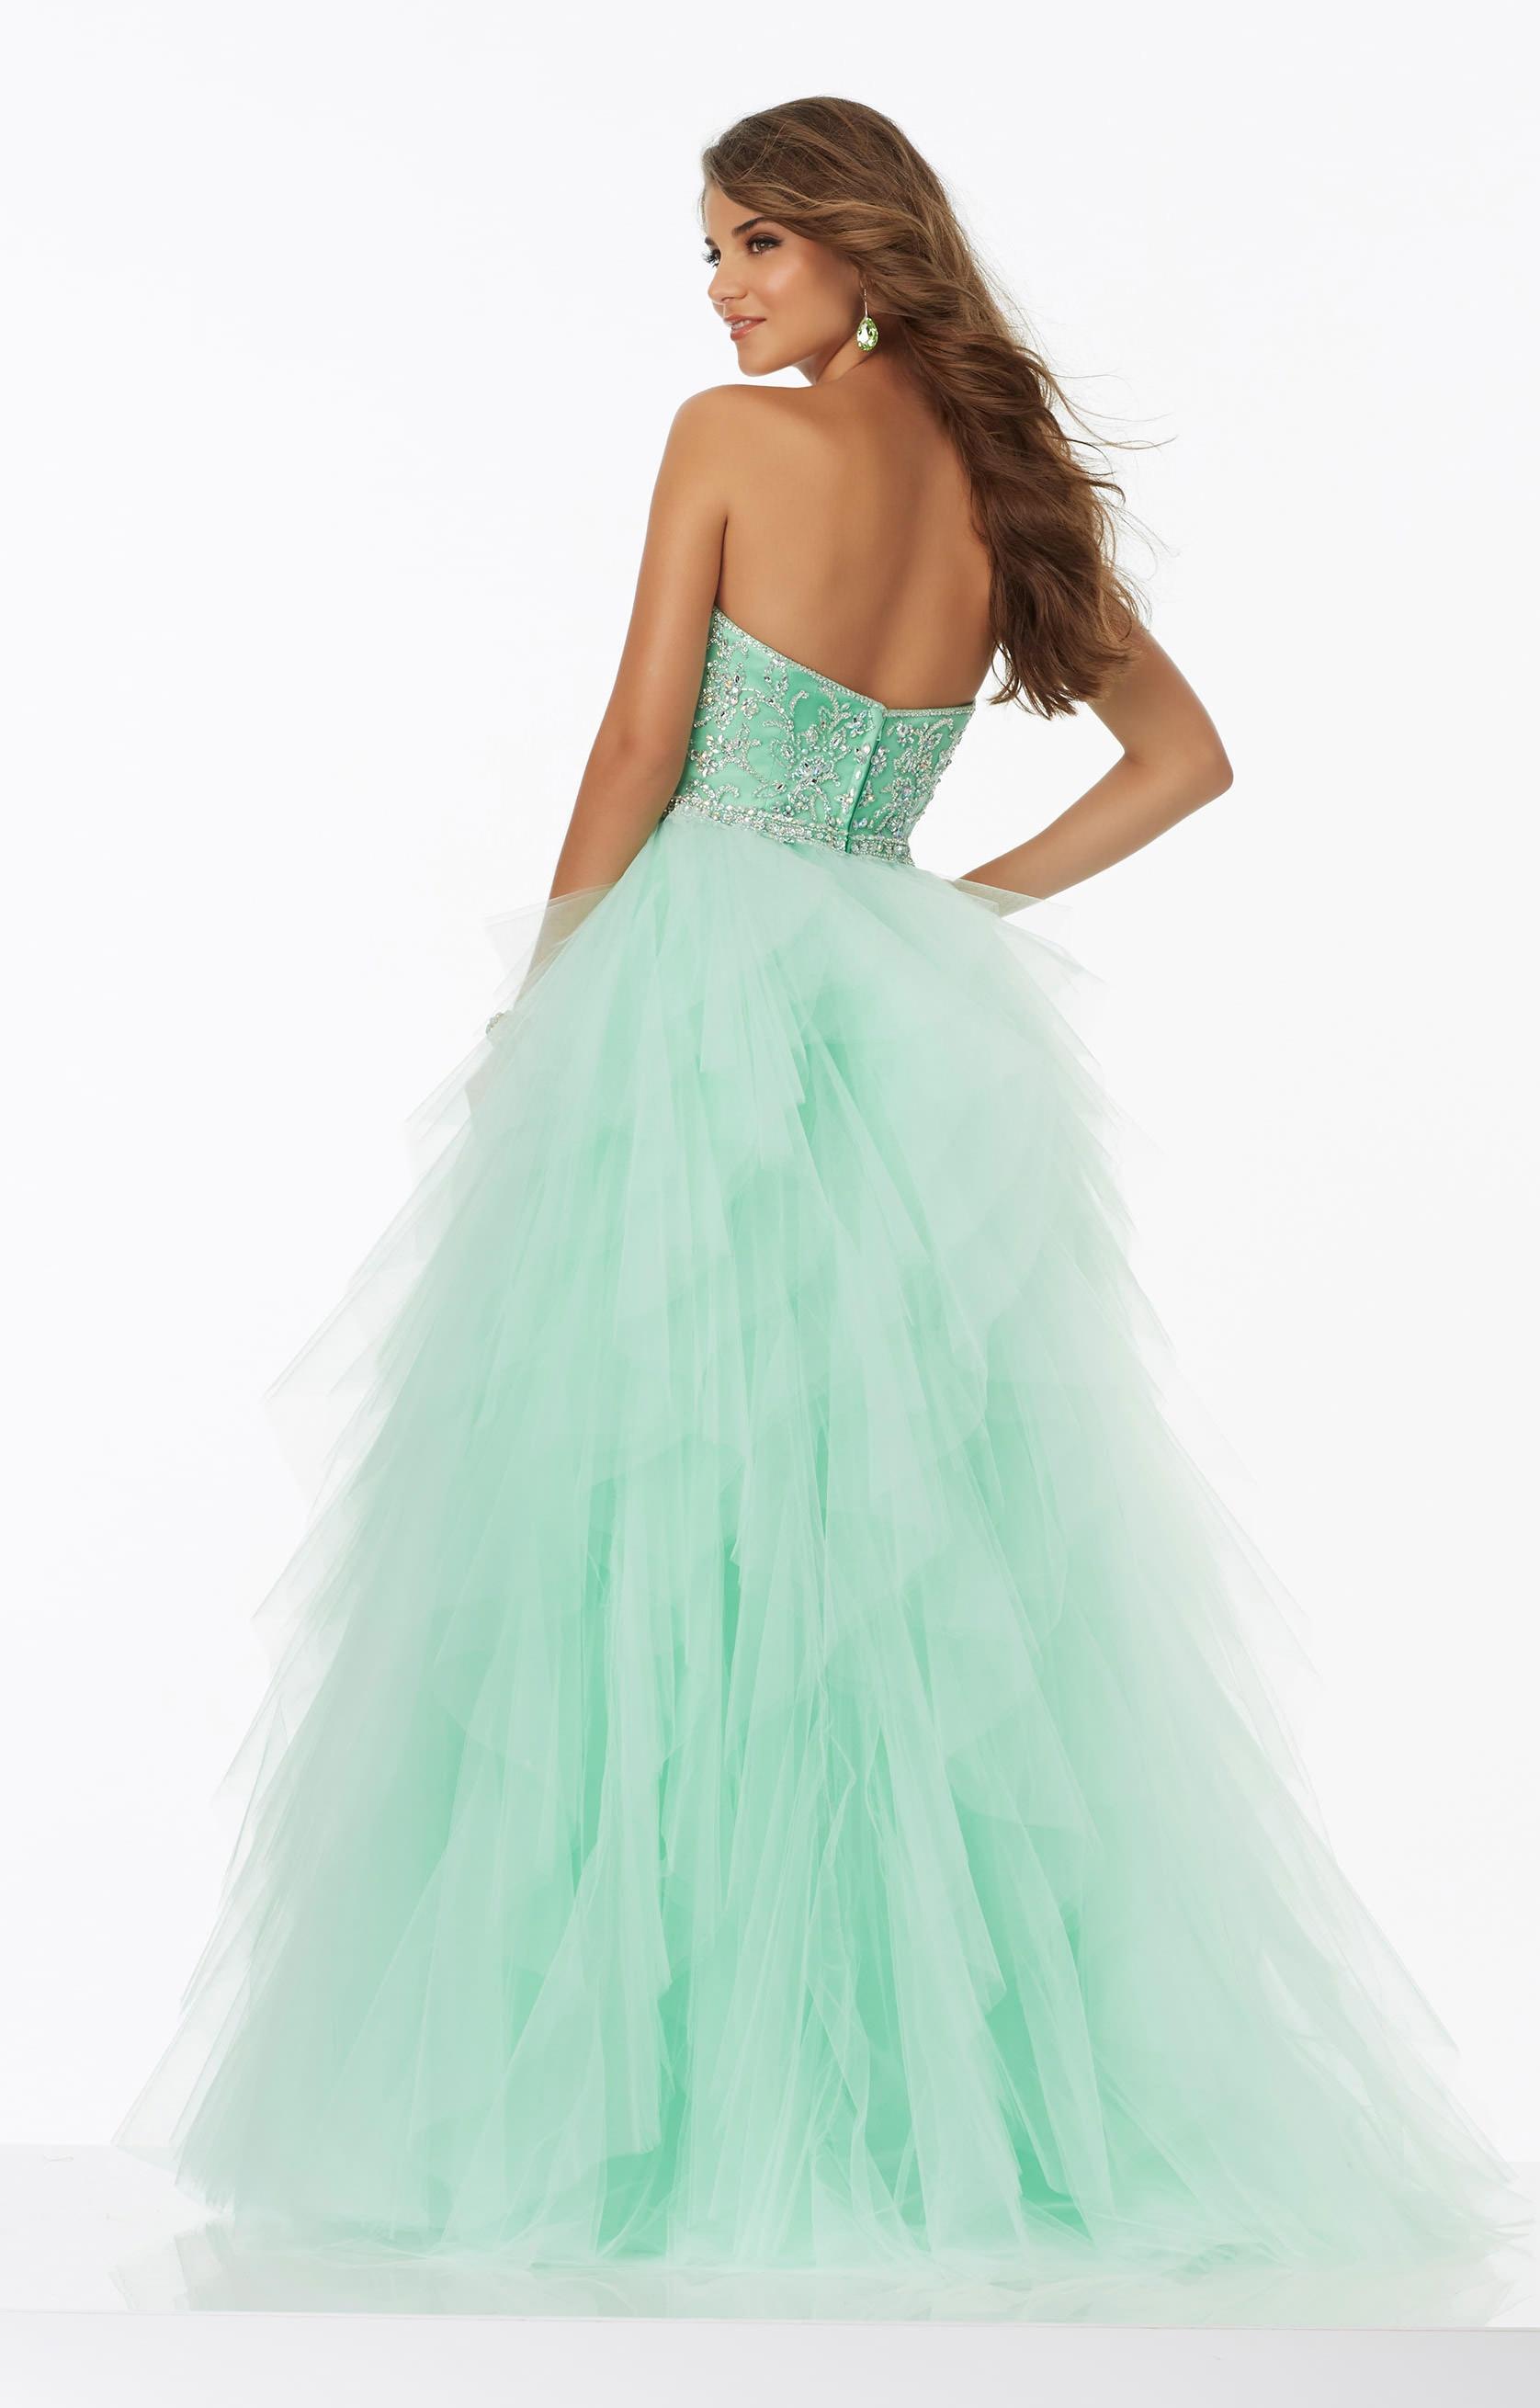 Mori Lee Prom 99086 - Formal Evening Prom Dress